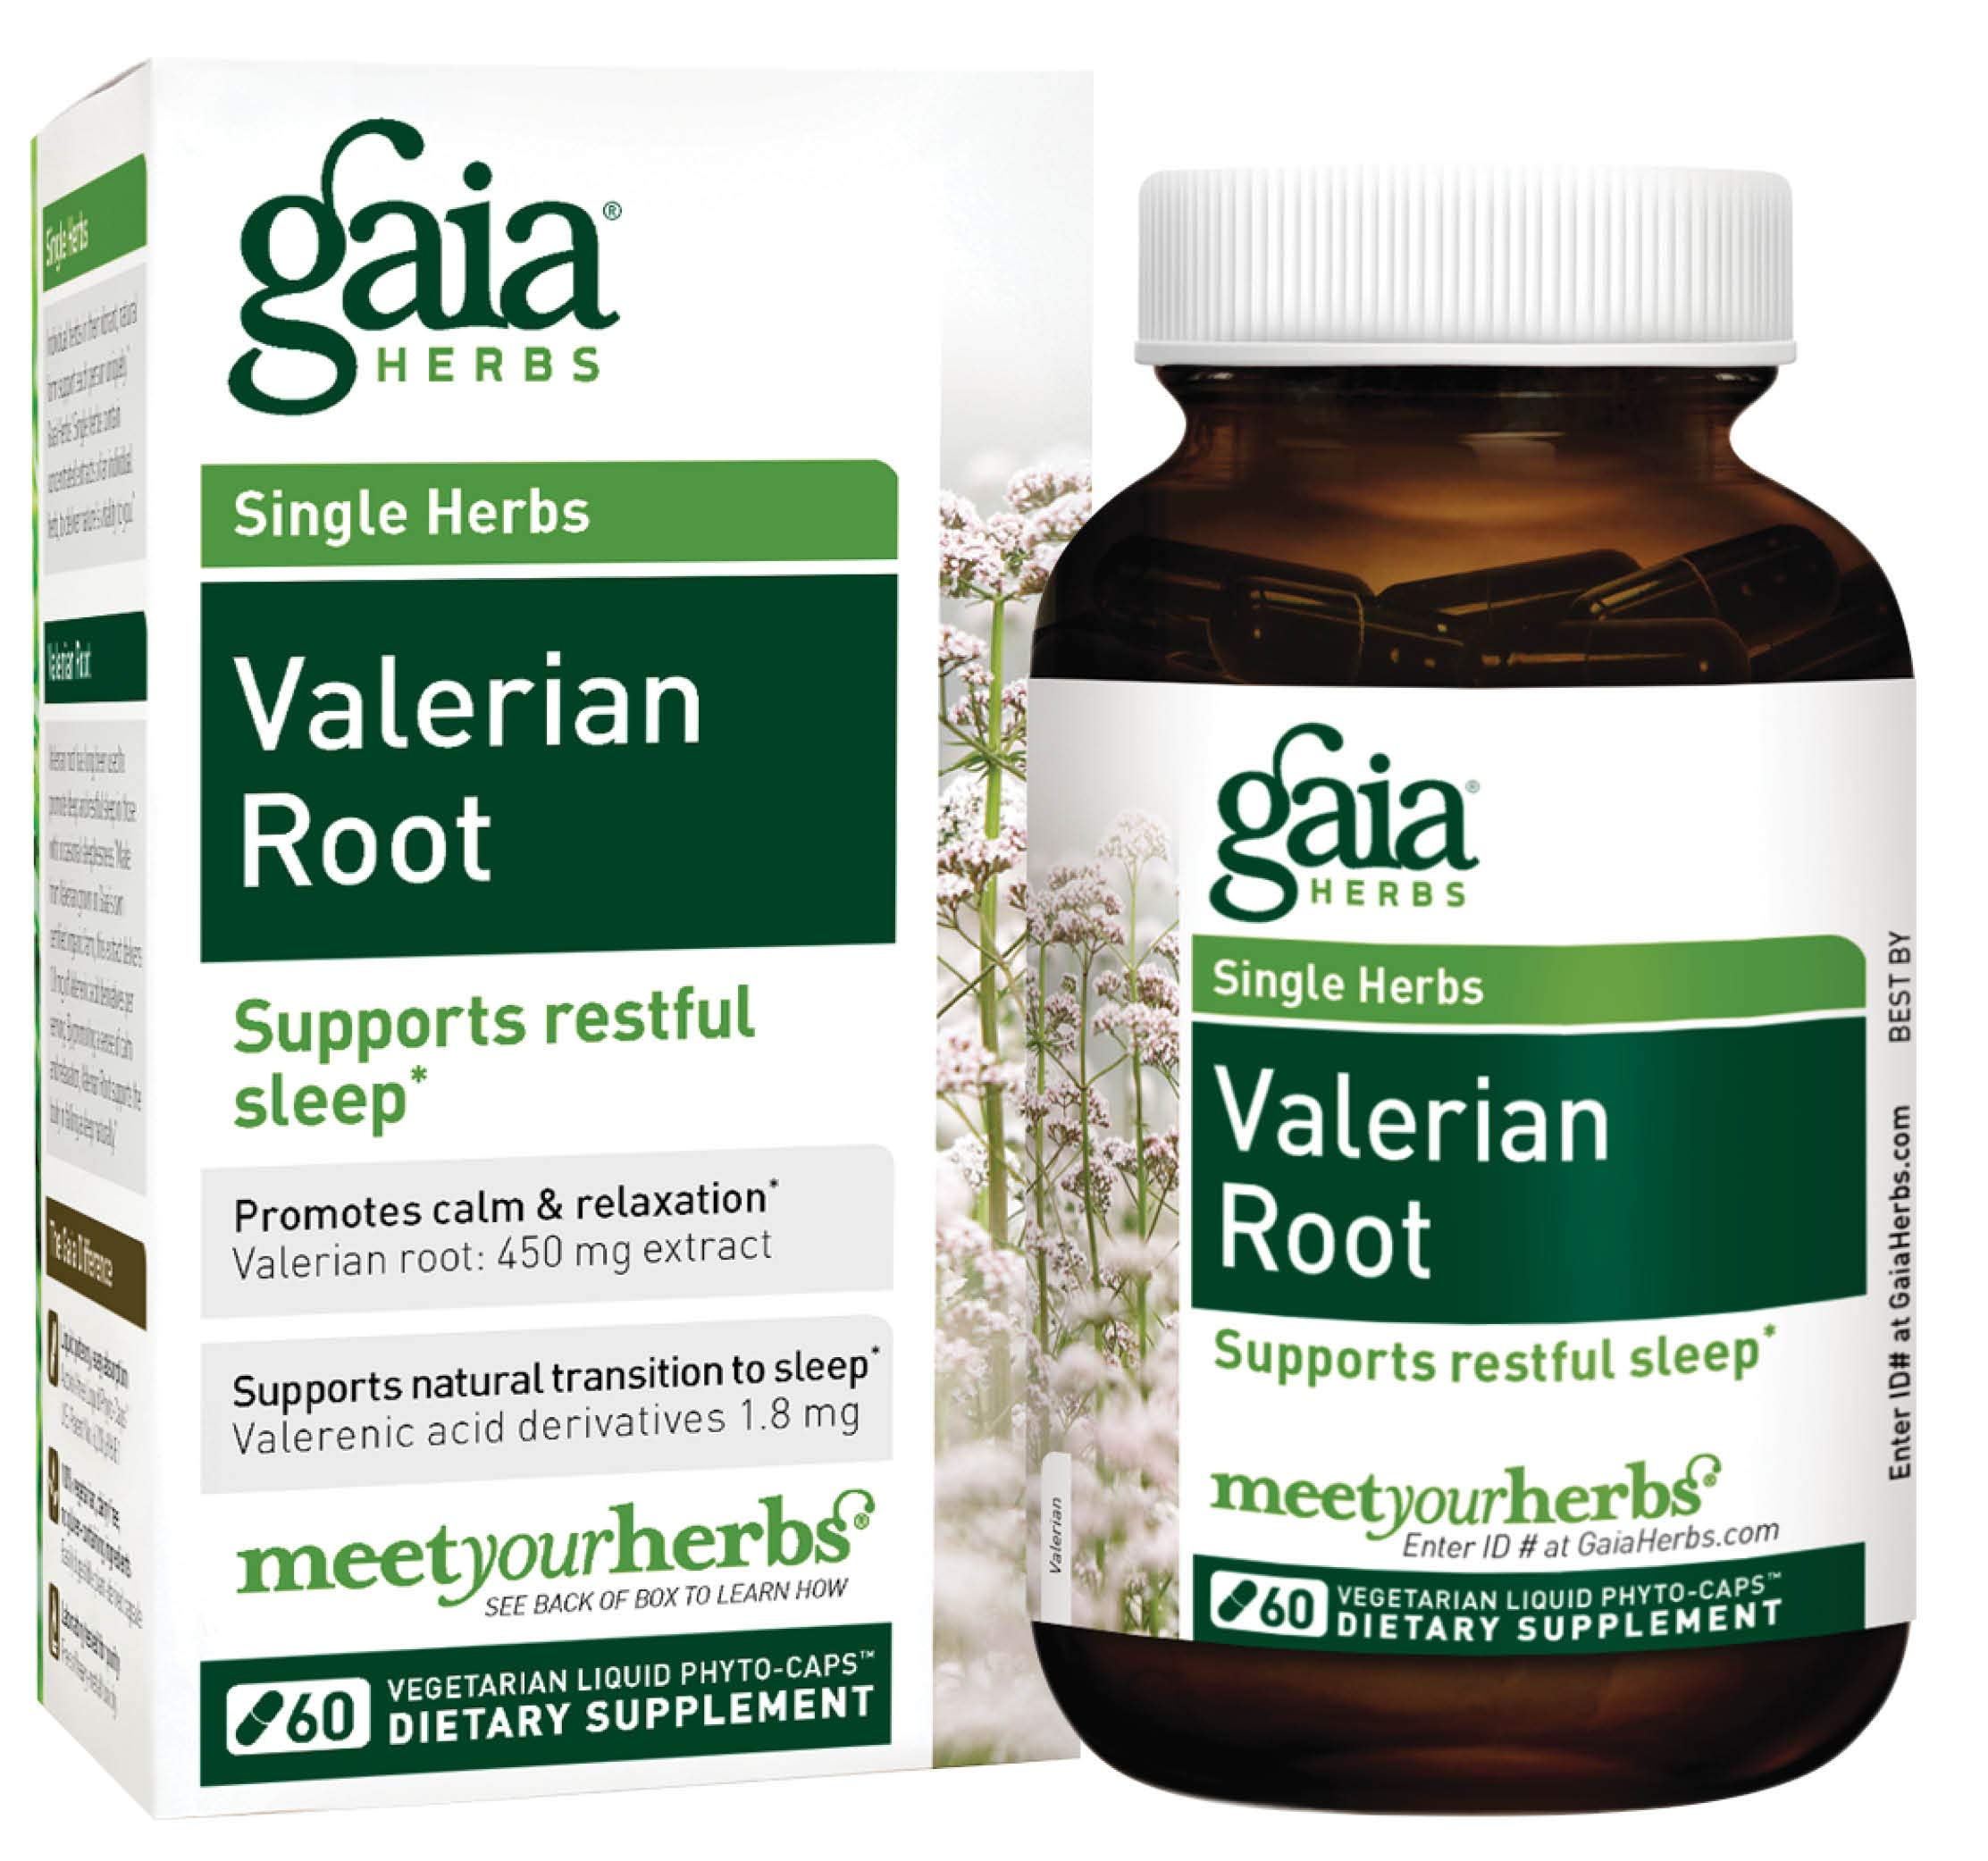 Gaia Herbs Valerian Root, Vegan Liquid Capsules, 60 Count - Relaxing Natural Sleep Aid with No Melatonin, Non-Habit Forming